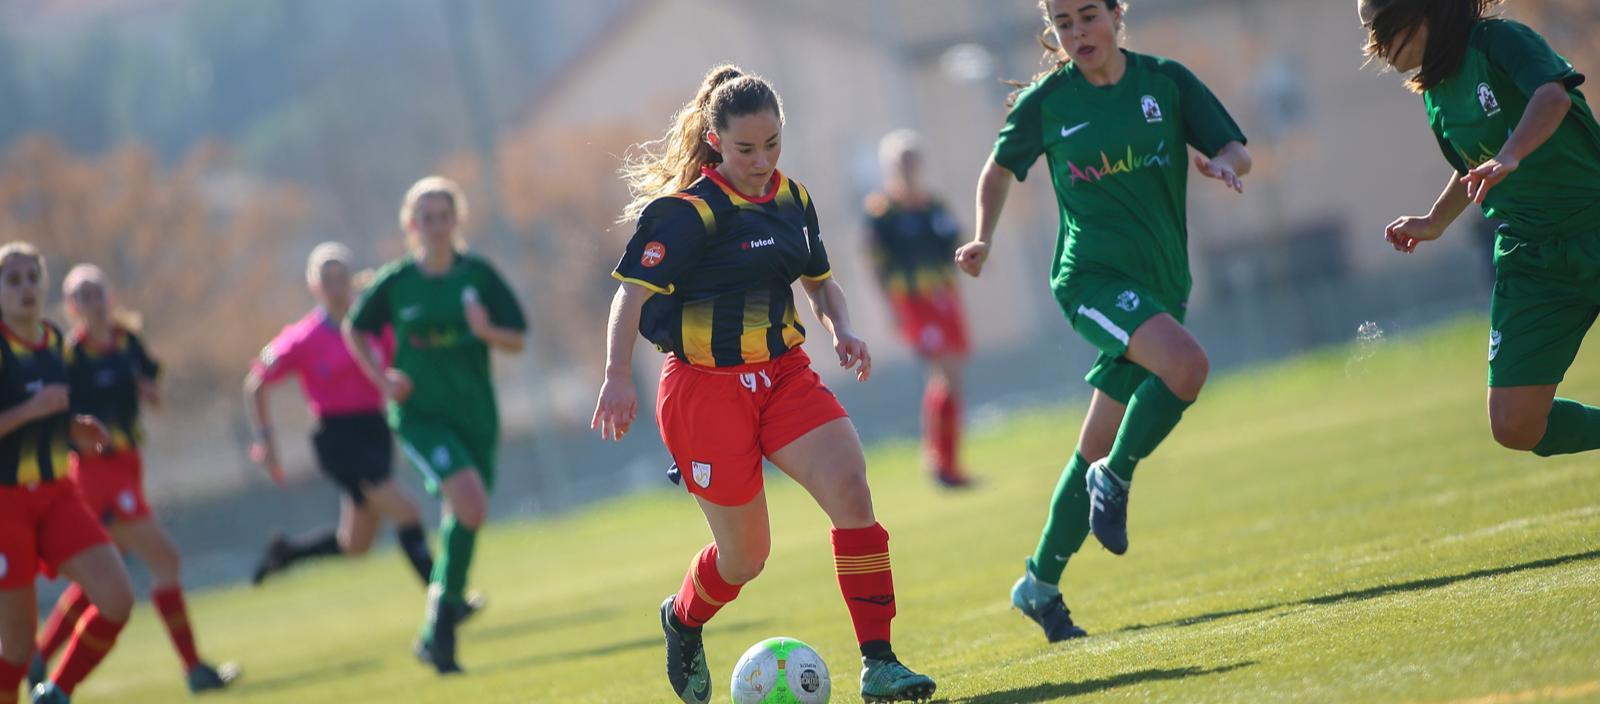 Treballada i soferta victòria de la sub 18 femenina davant Andalusia